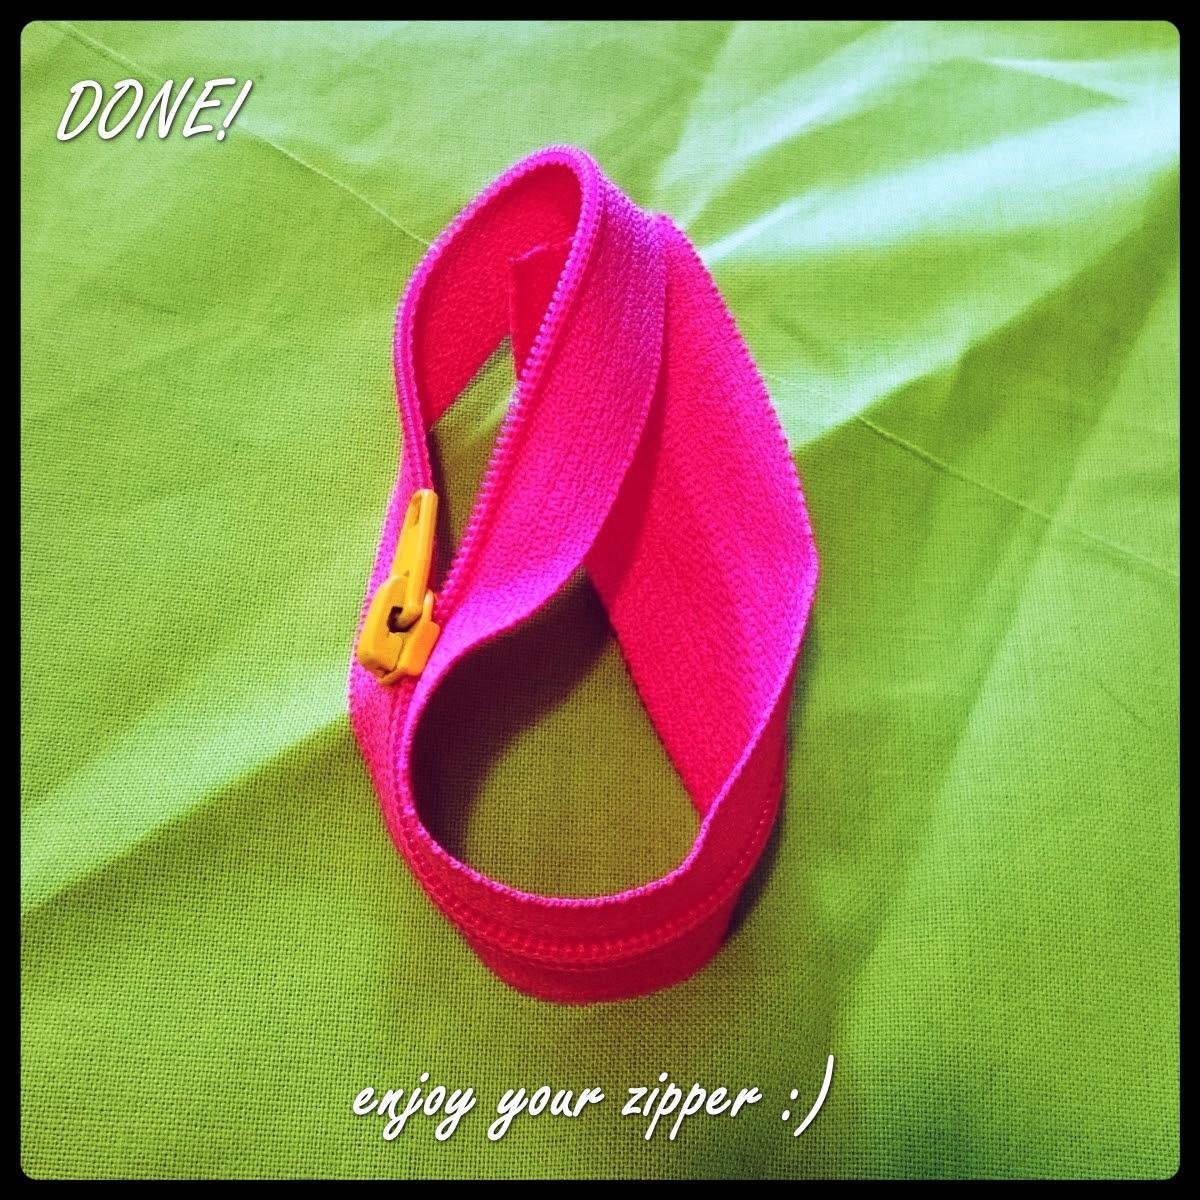 how to put a zipper pull on zipper tape